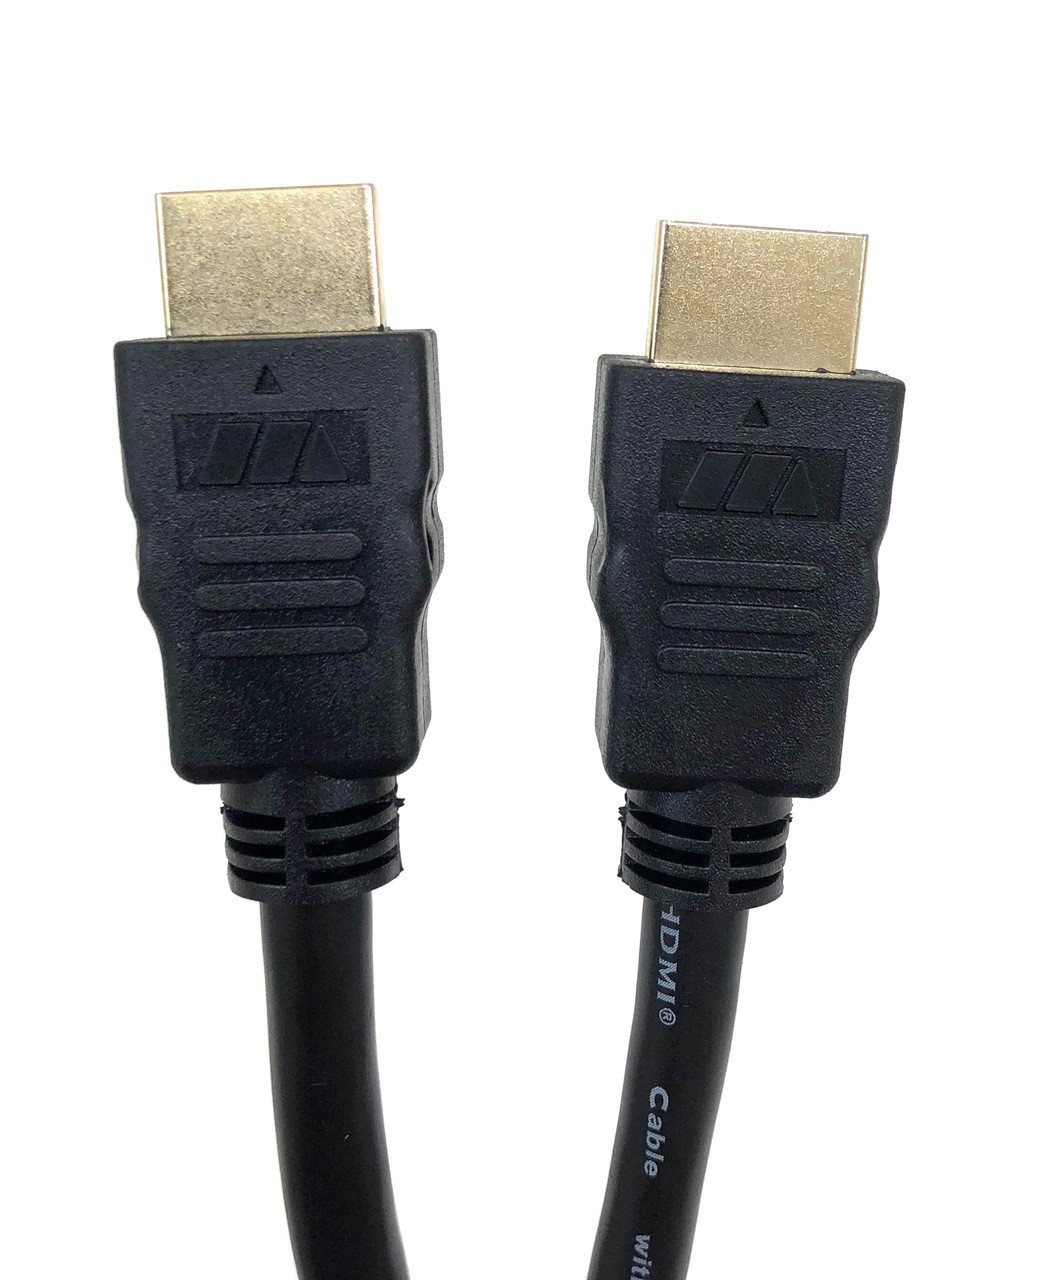 3 Feet Premium 4K High Speed HDMI M/M Cable